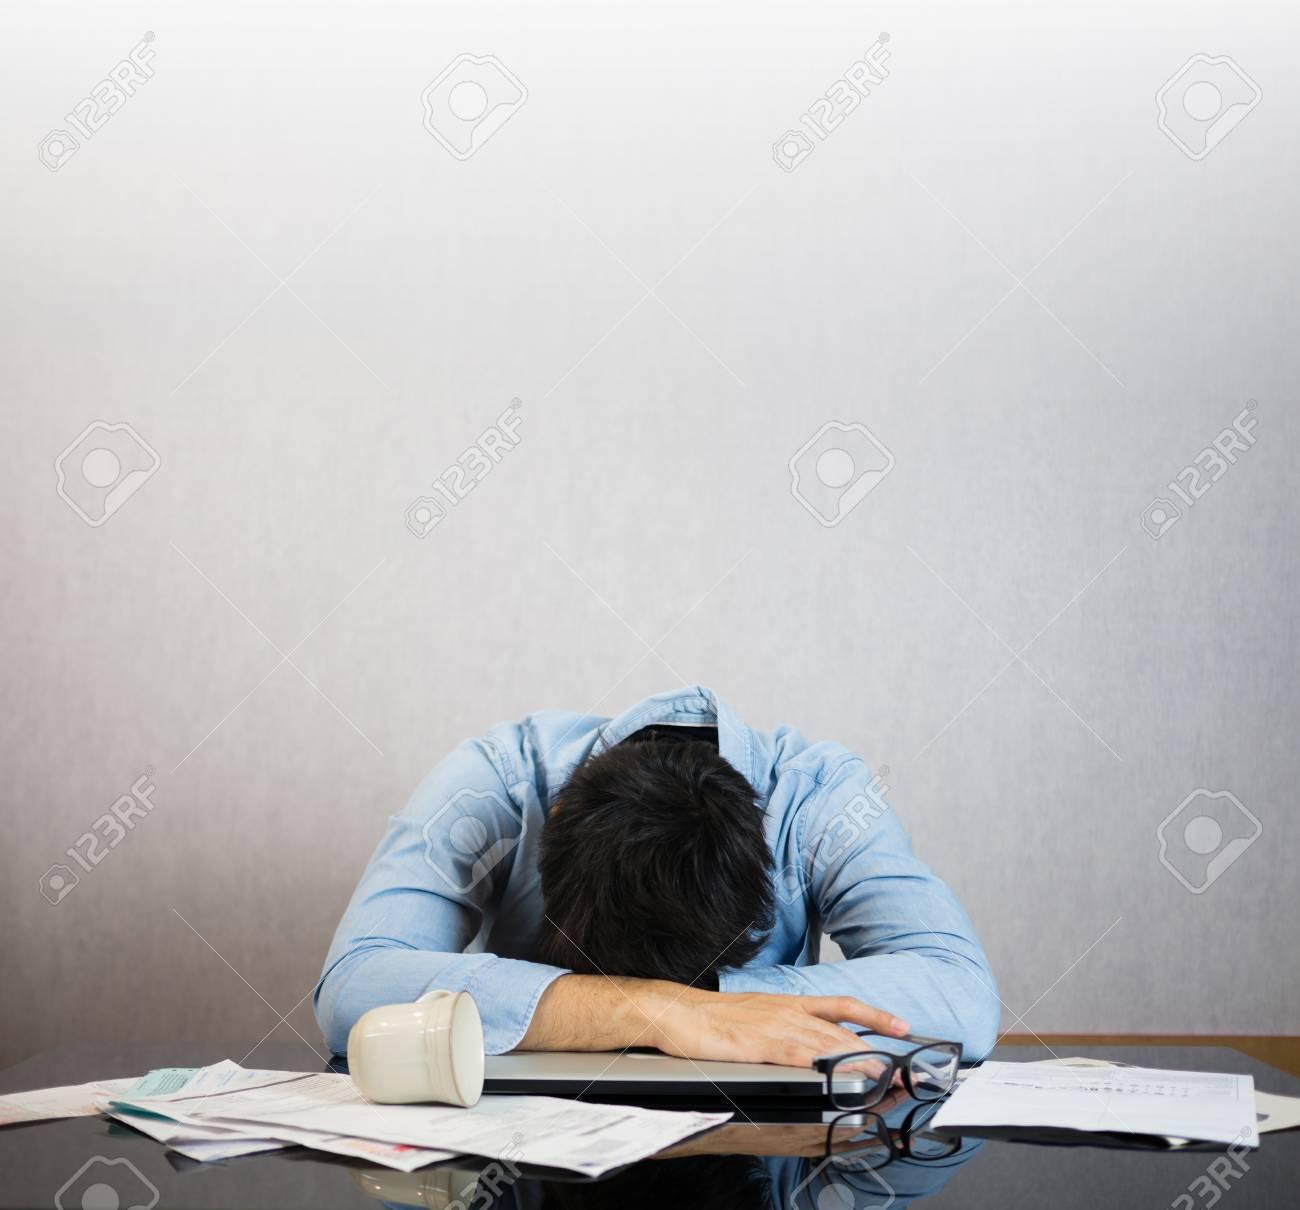 Fall asleep on work desk, stress and study hard concept - 86951568